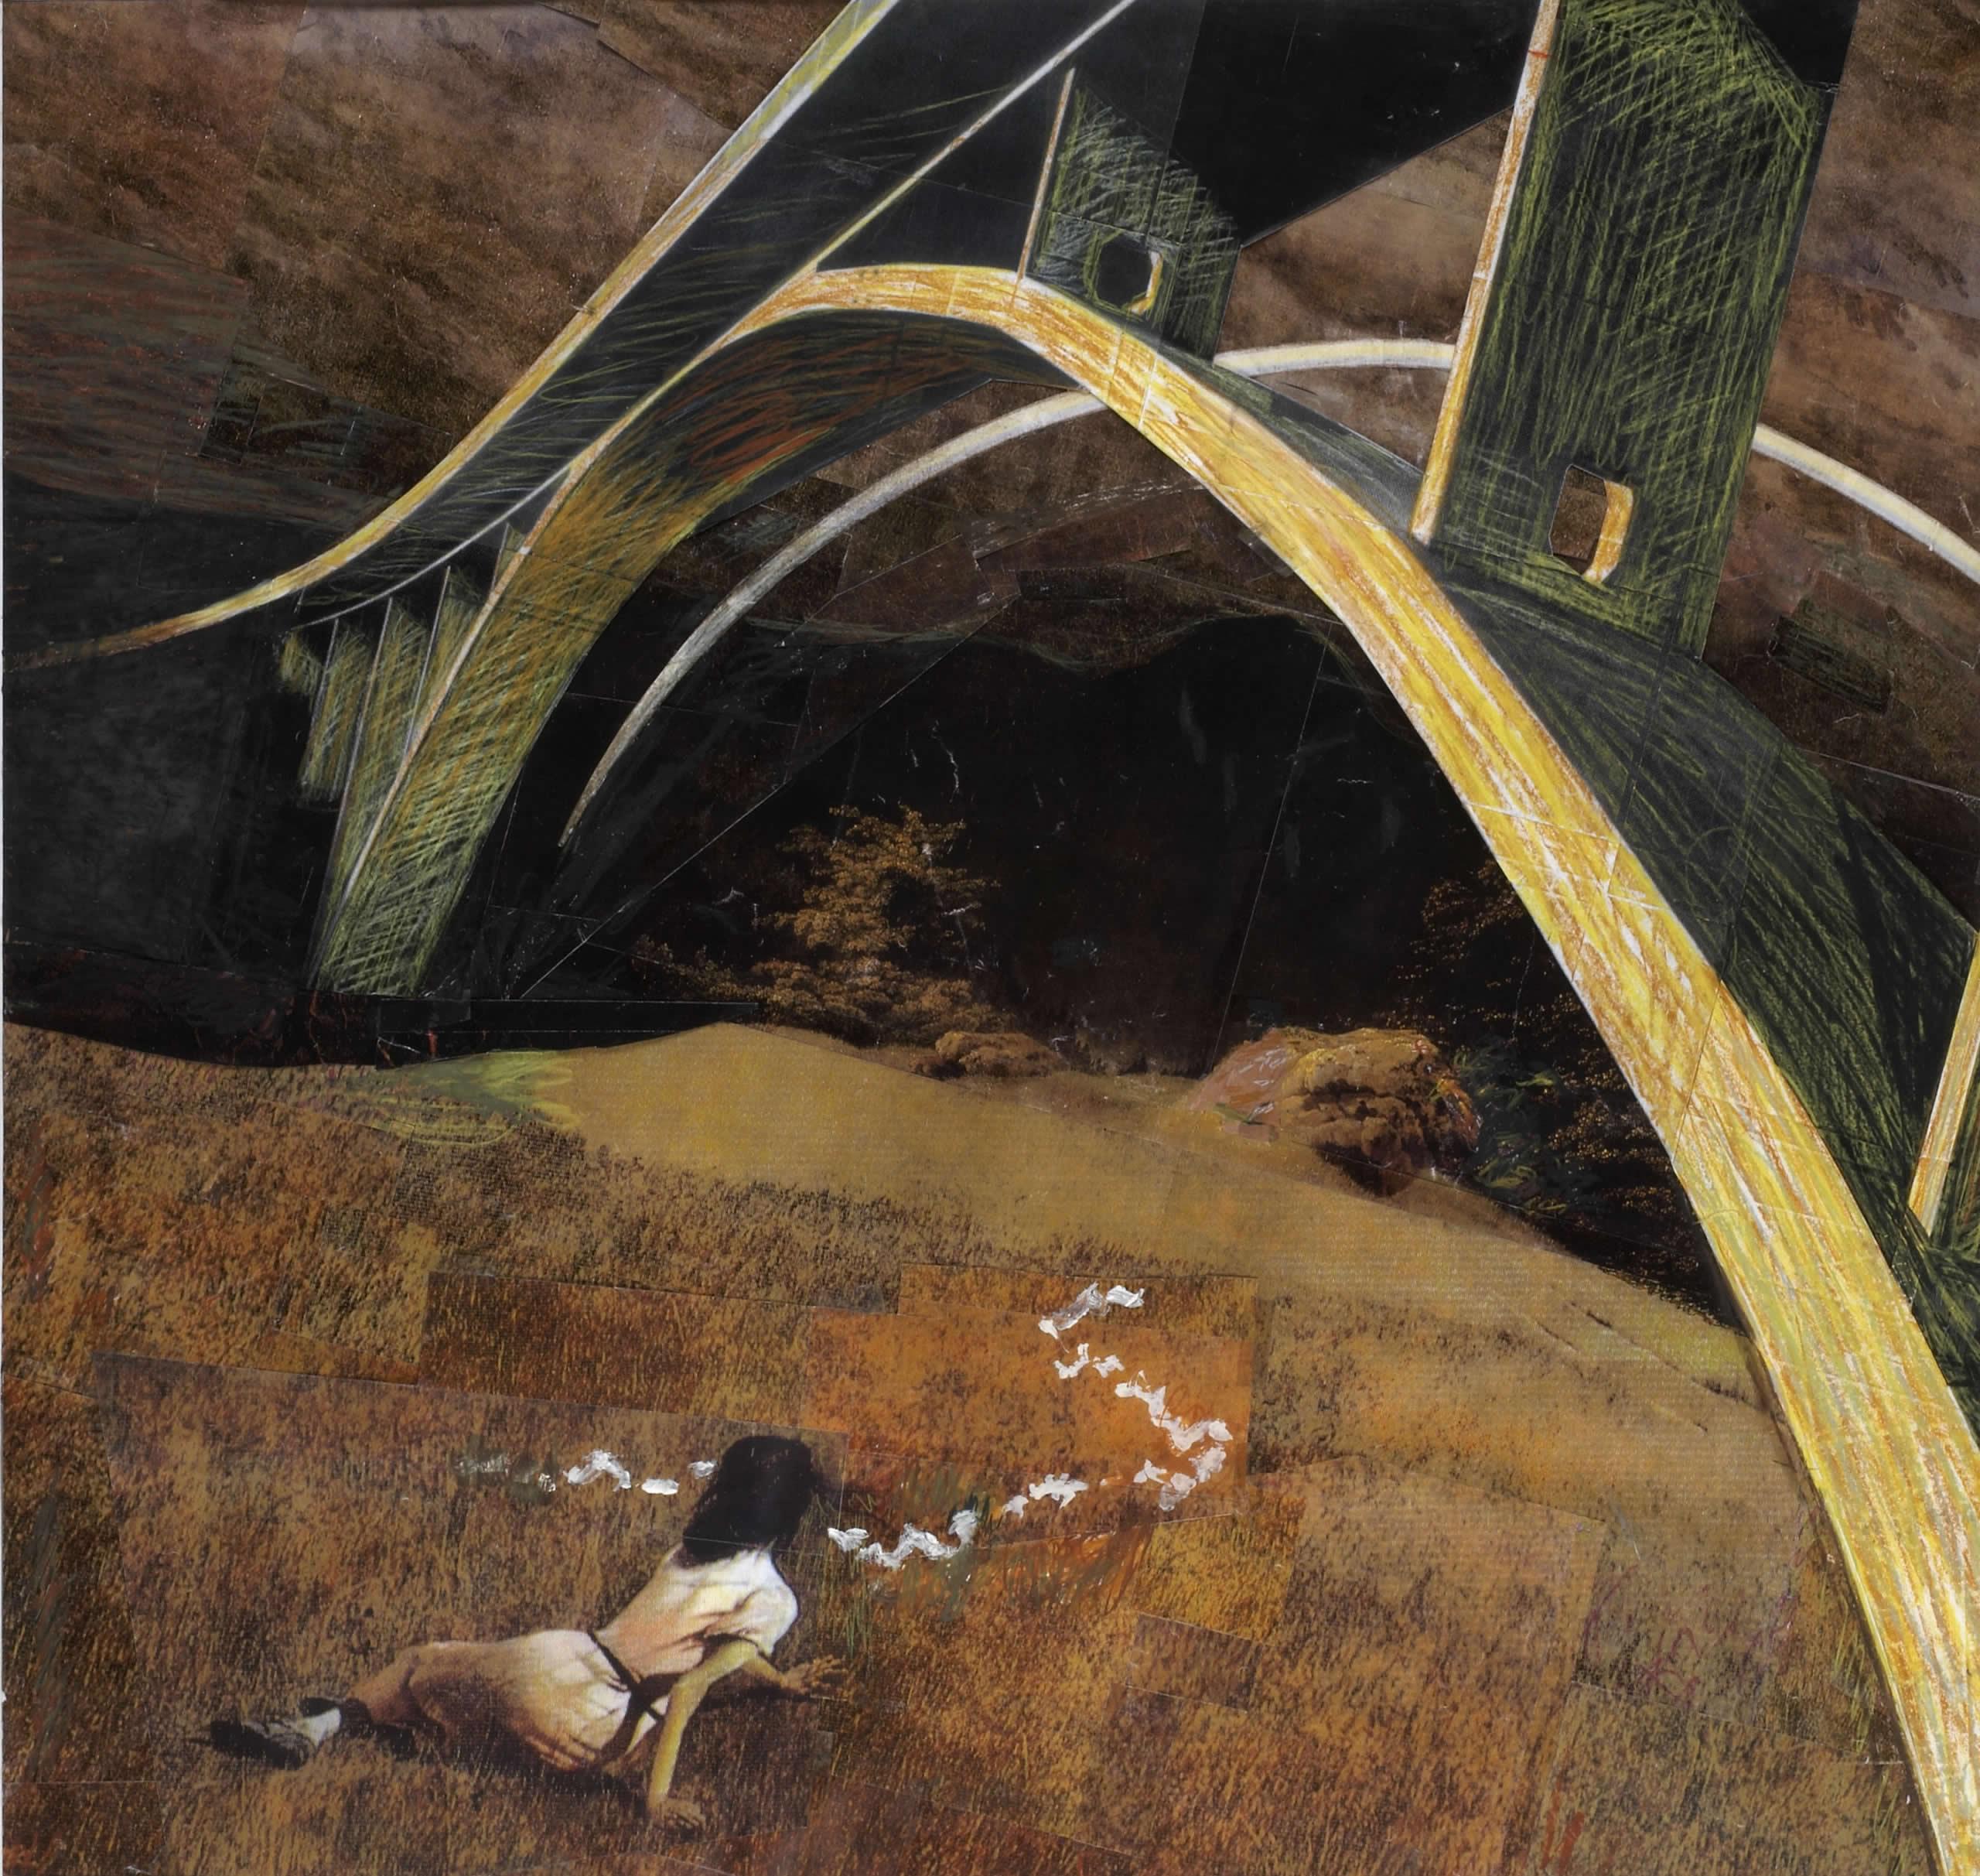 Max Peintner | Nach dem Regen | 2003 | Ölkreide | 102 x 119 cm | Foto Archiv Paintner | Galerie3